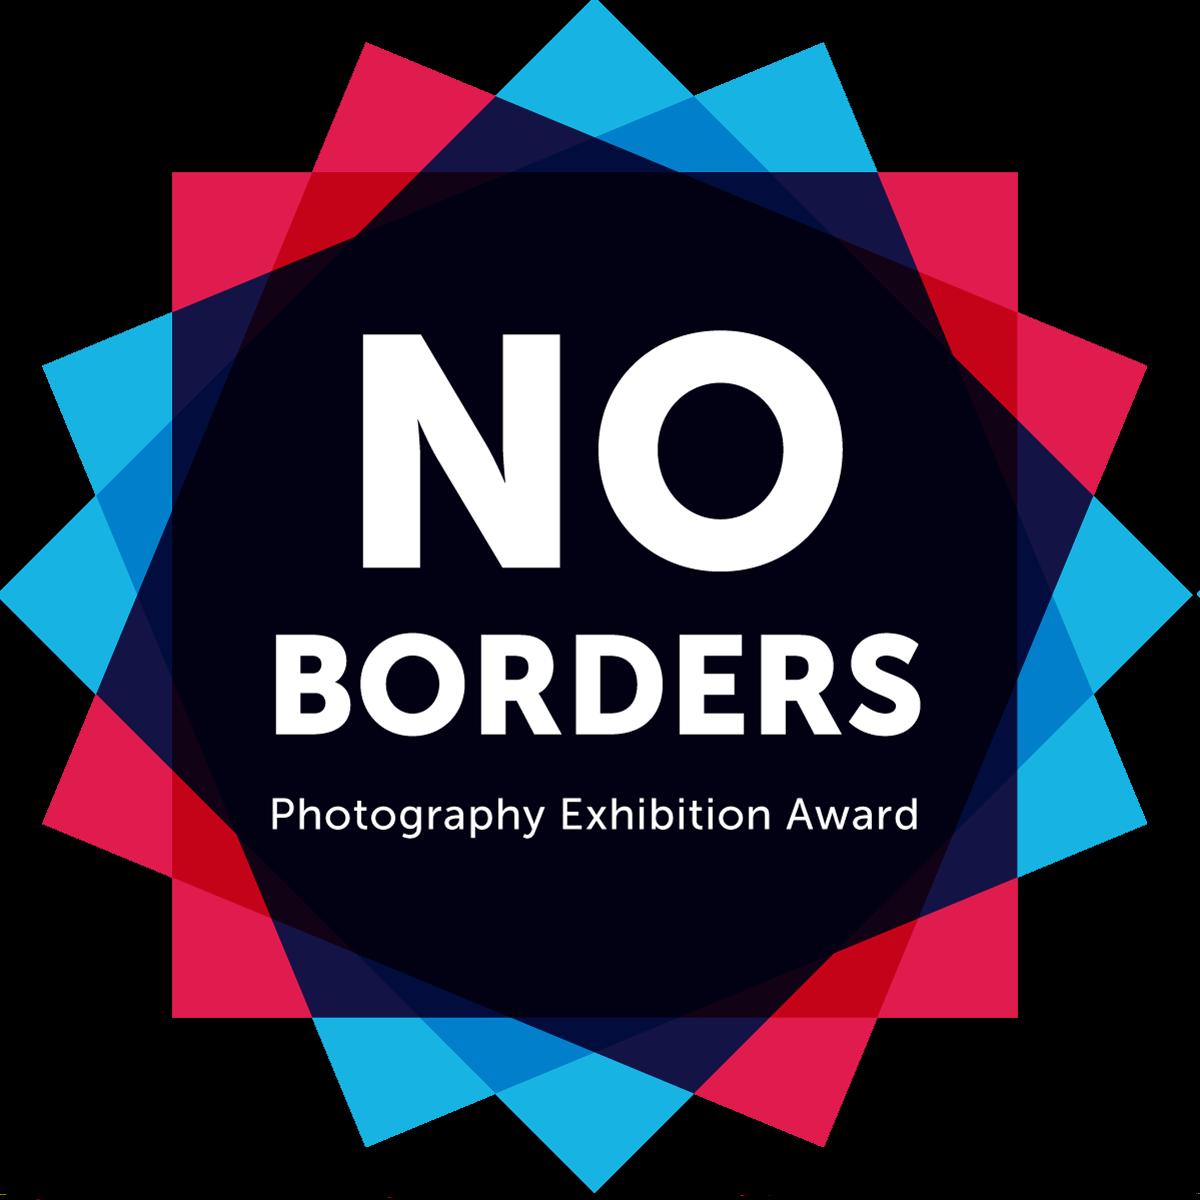 No Borders Award